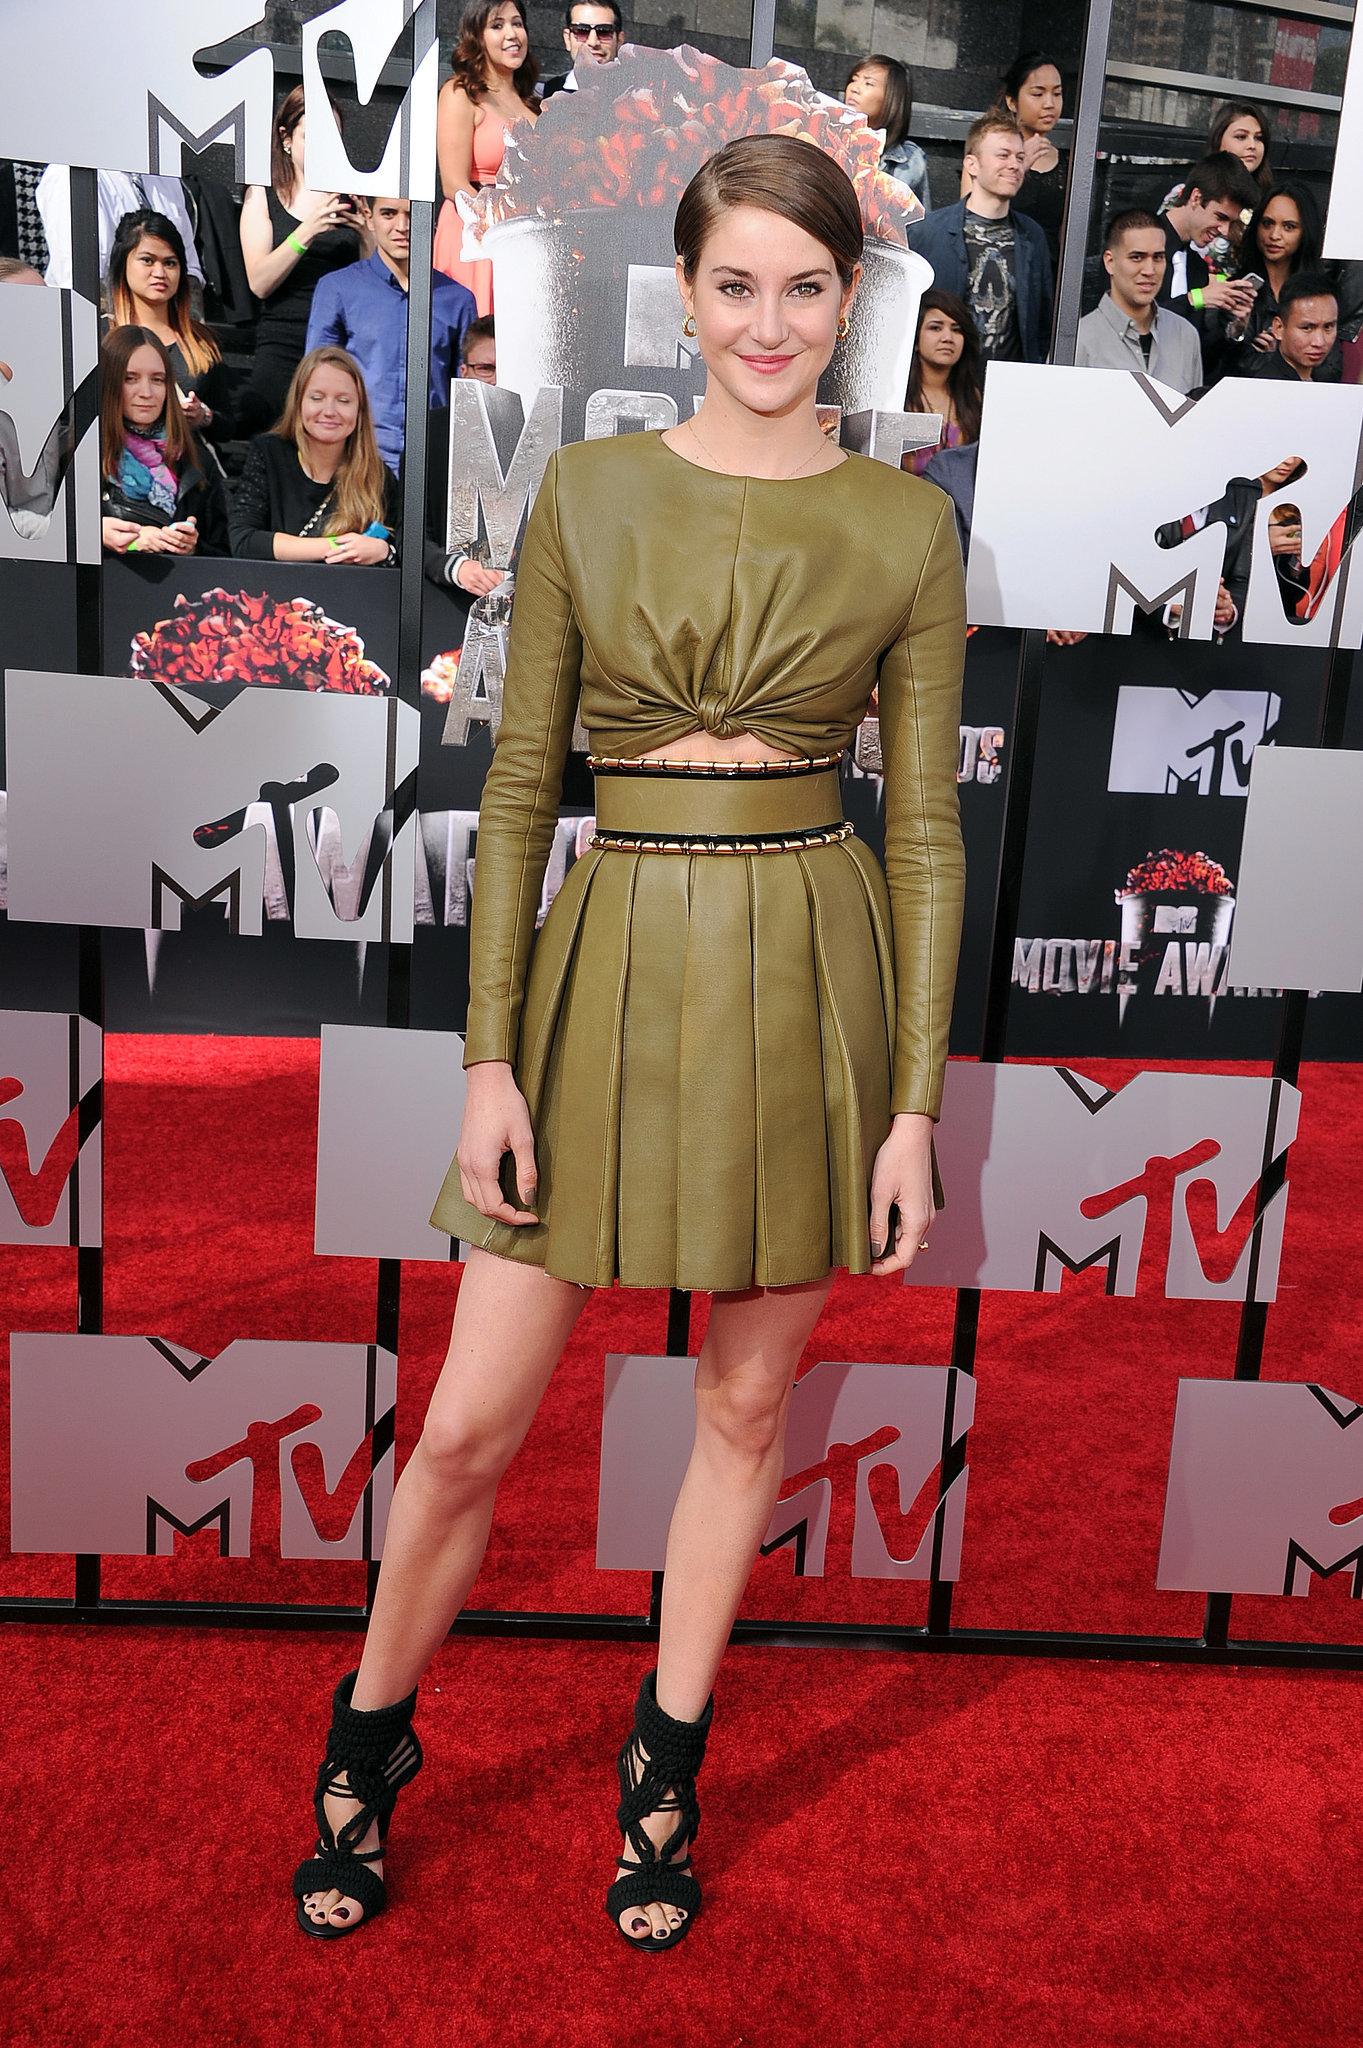 Shailene Woodley at the 2014 MTV Movie Awards